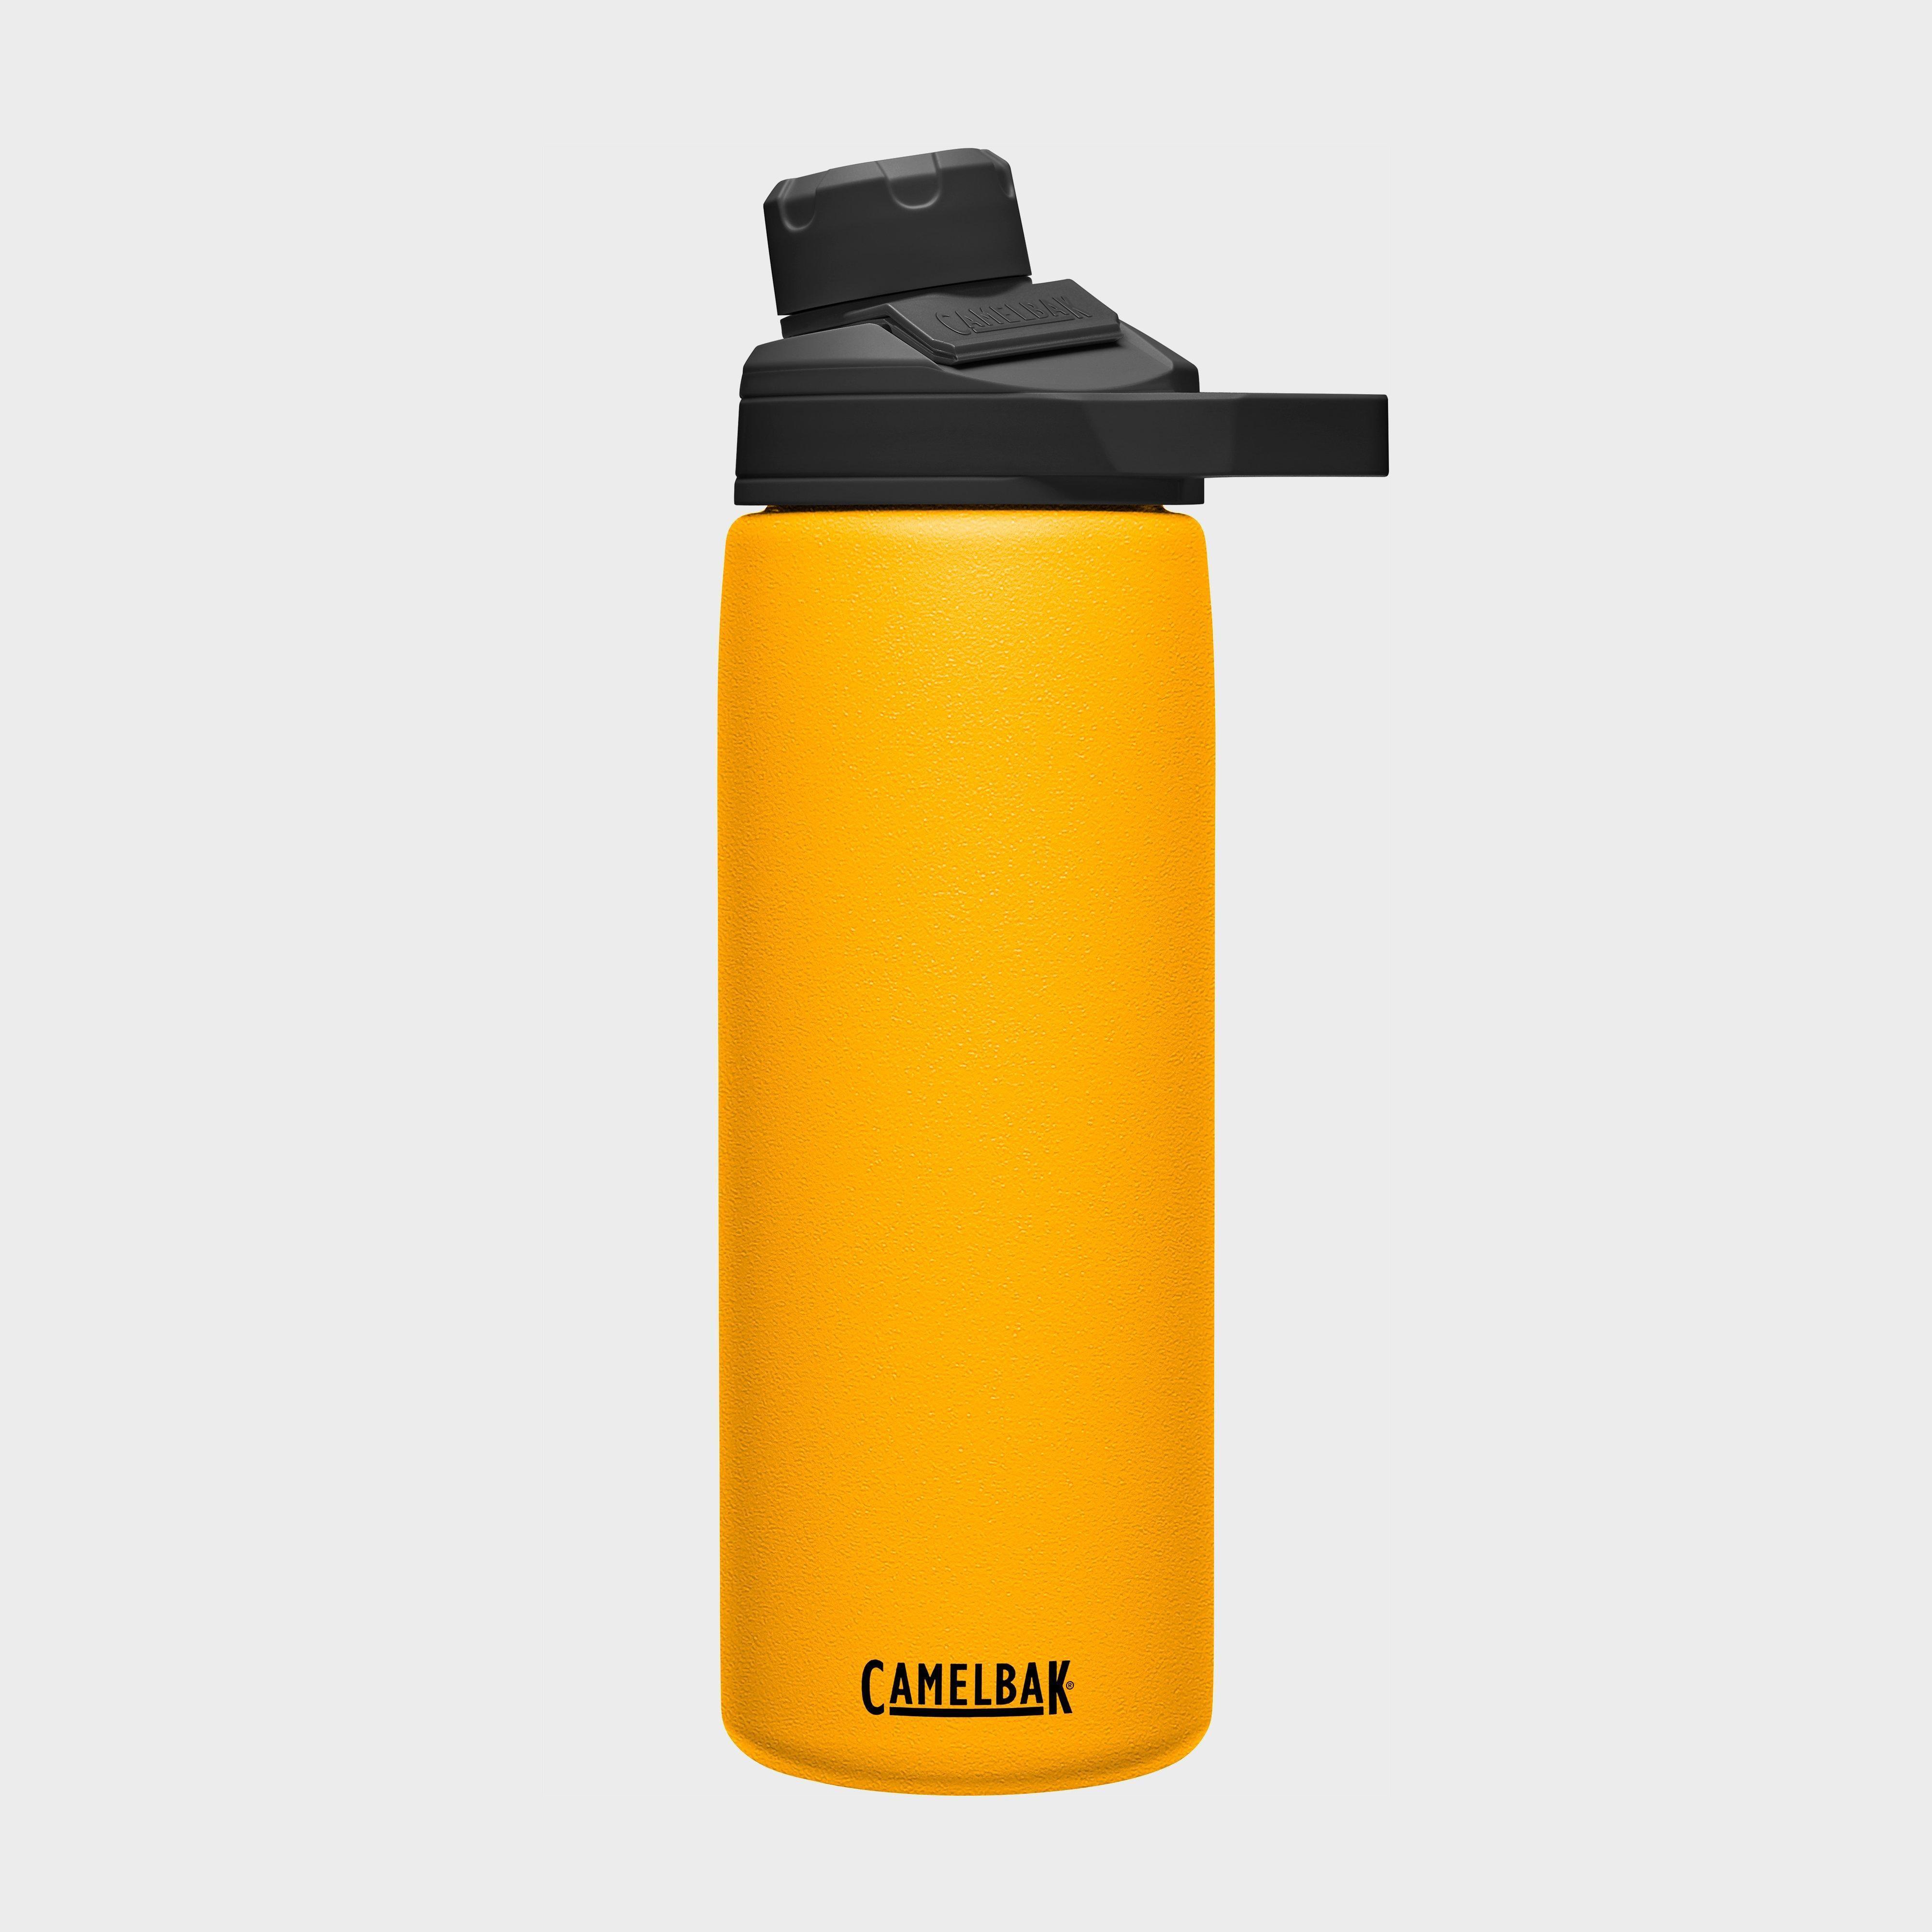 Camelbak Camelbak Chute Mag Vacuum Bottle 0.6 Litre, Yellow